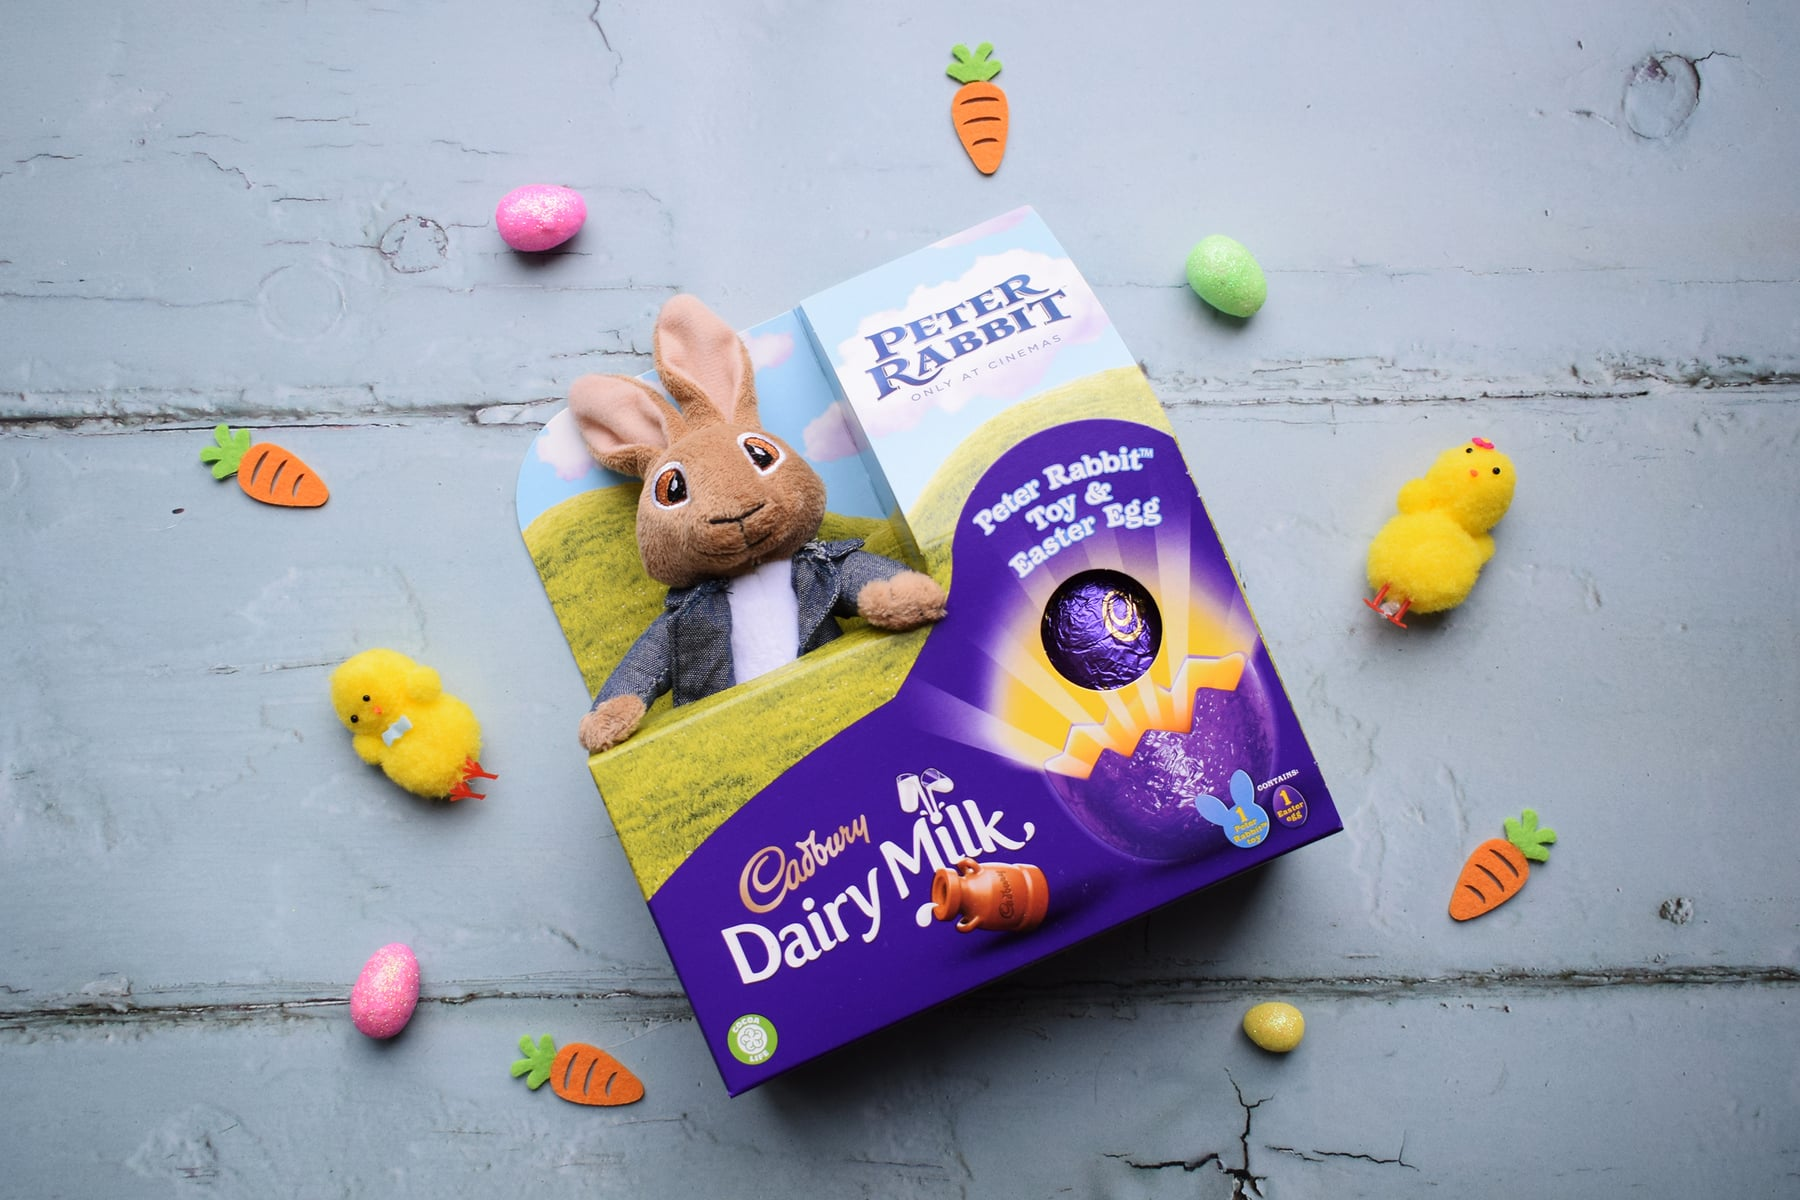 cadbury-peter-rabbit-easter-egg-ft